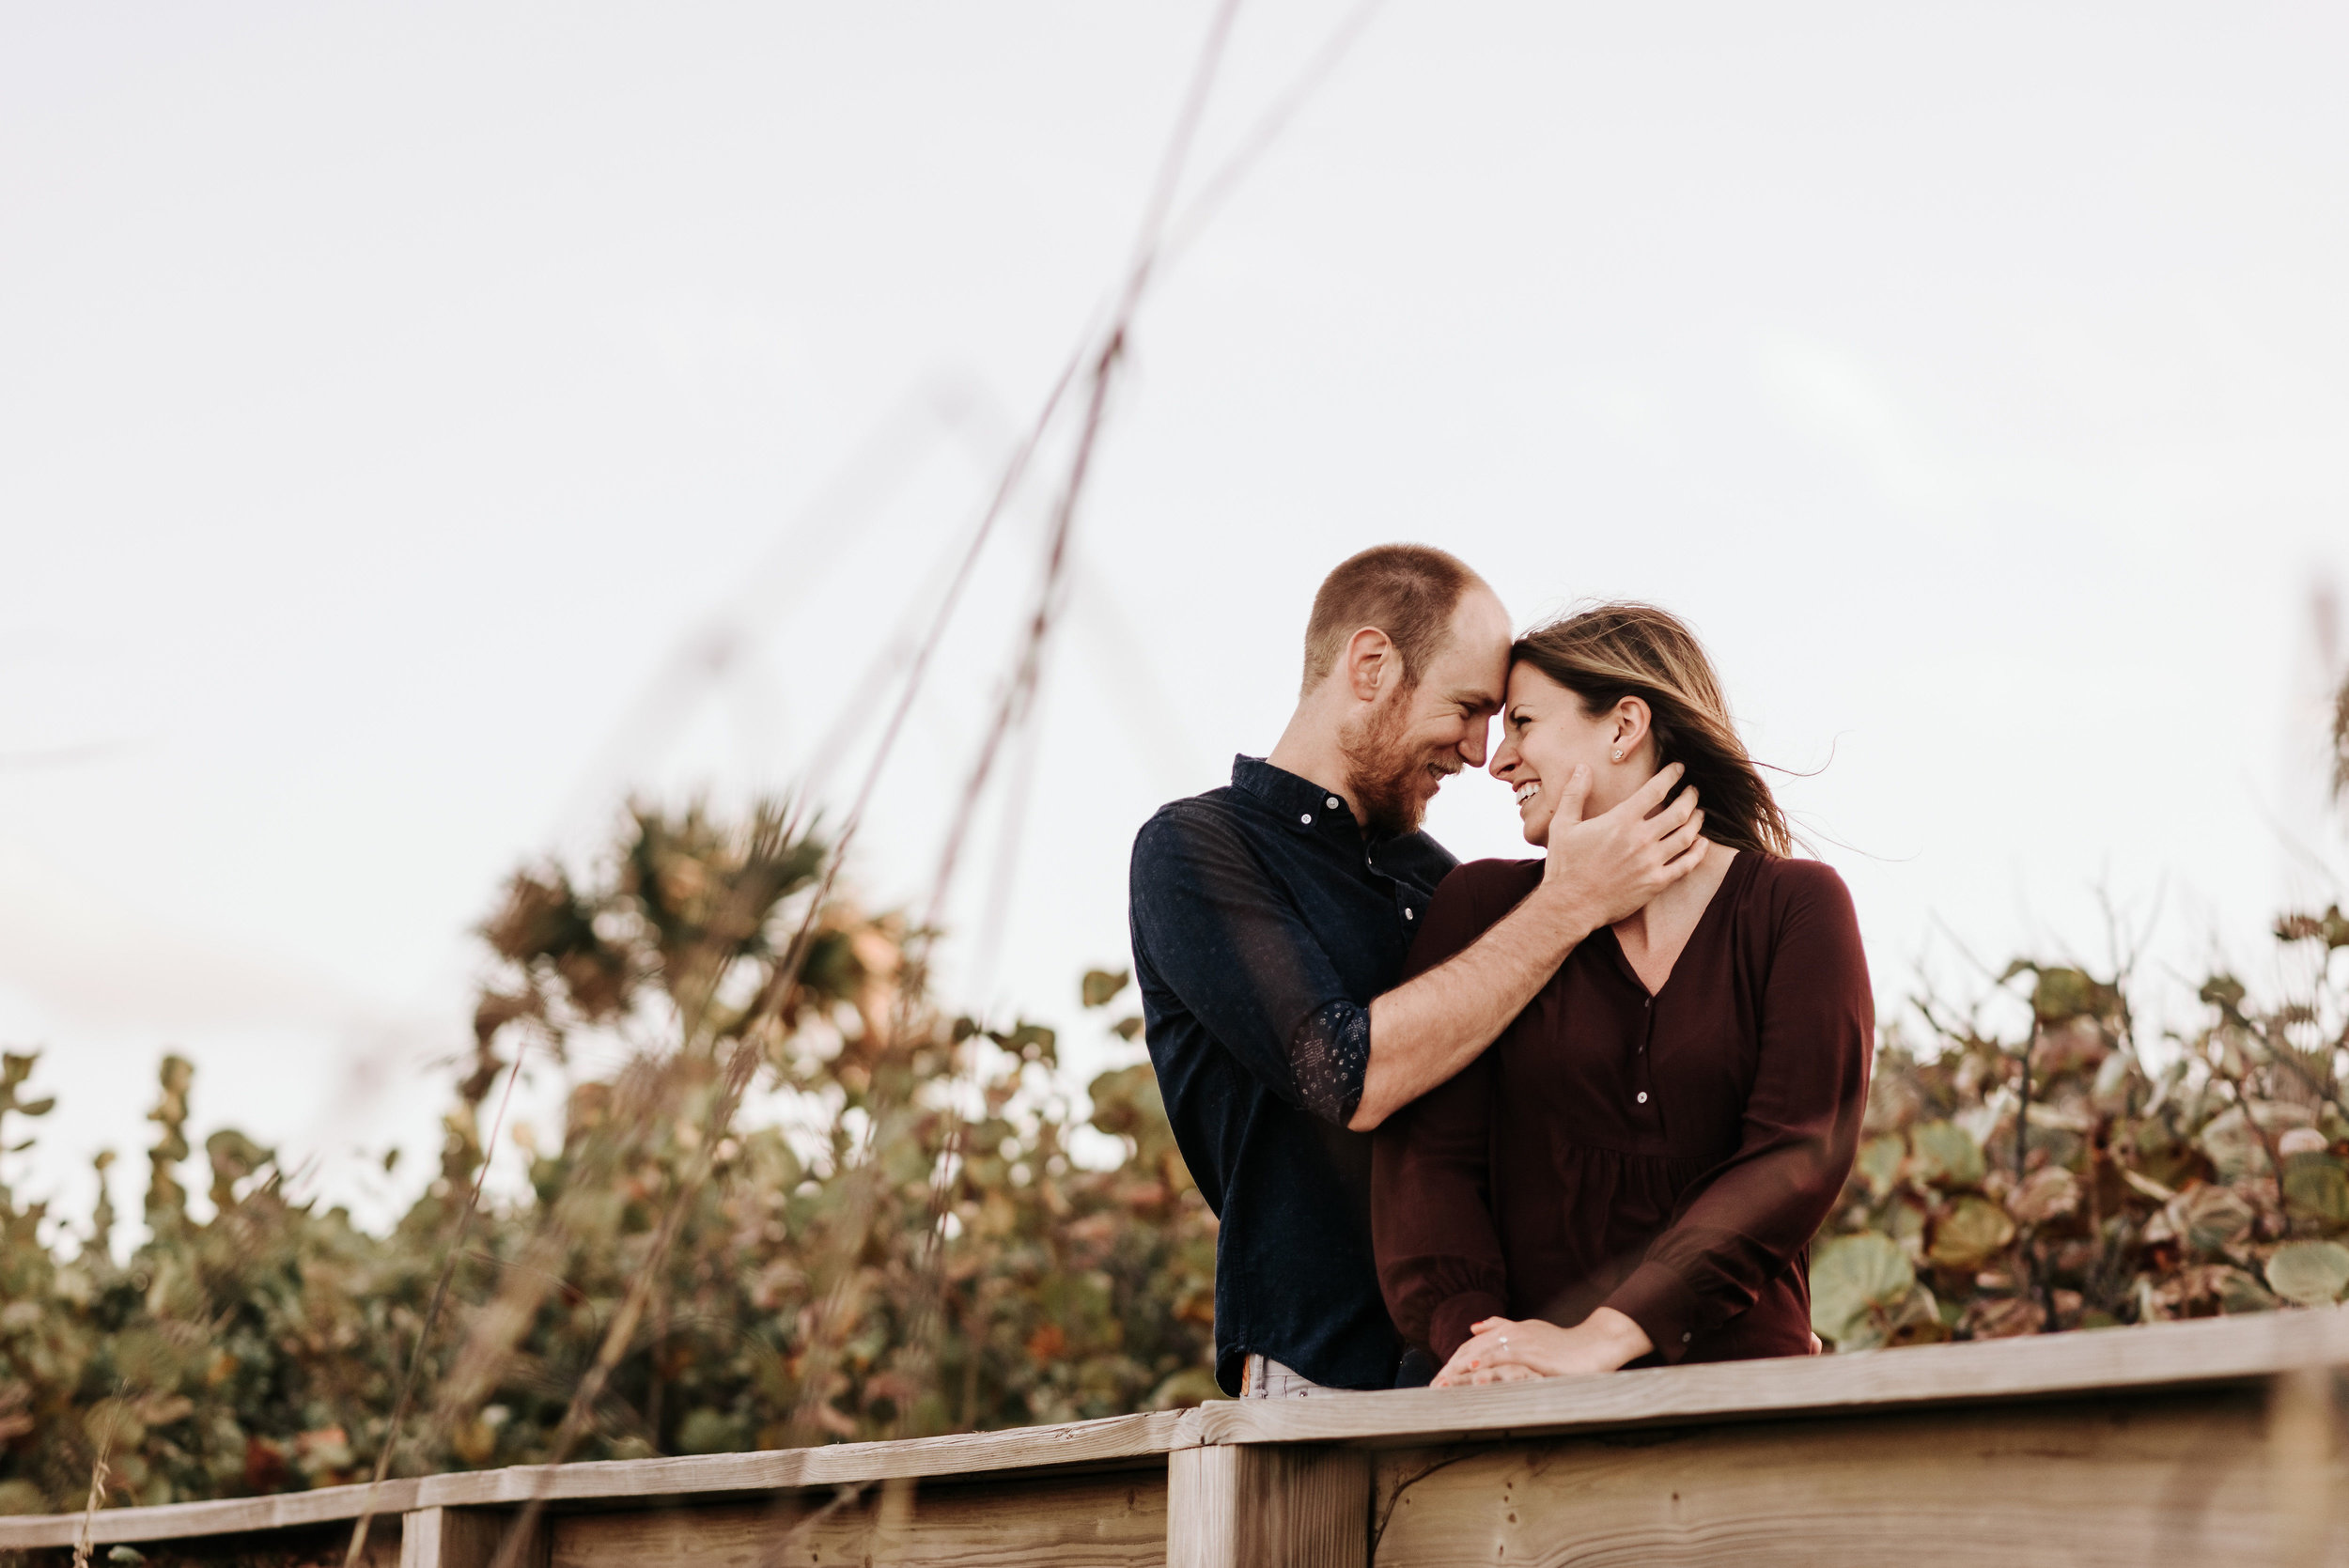 Courtney_Luke_Wedding_Engagement_Session_Cocoa_Beach_Florida_Photography_by_V_4611.jpg